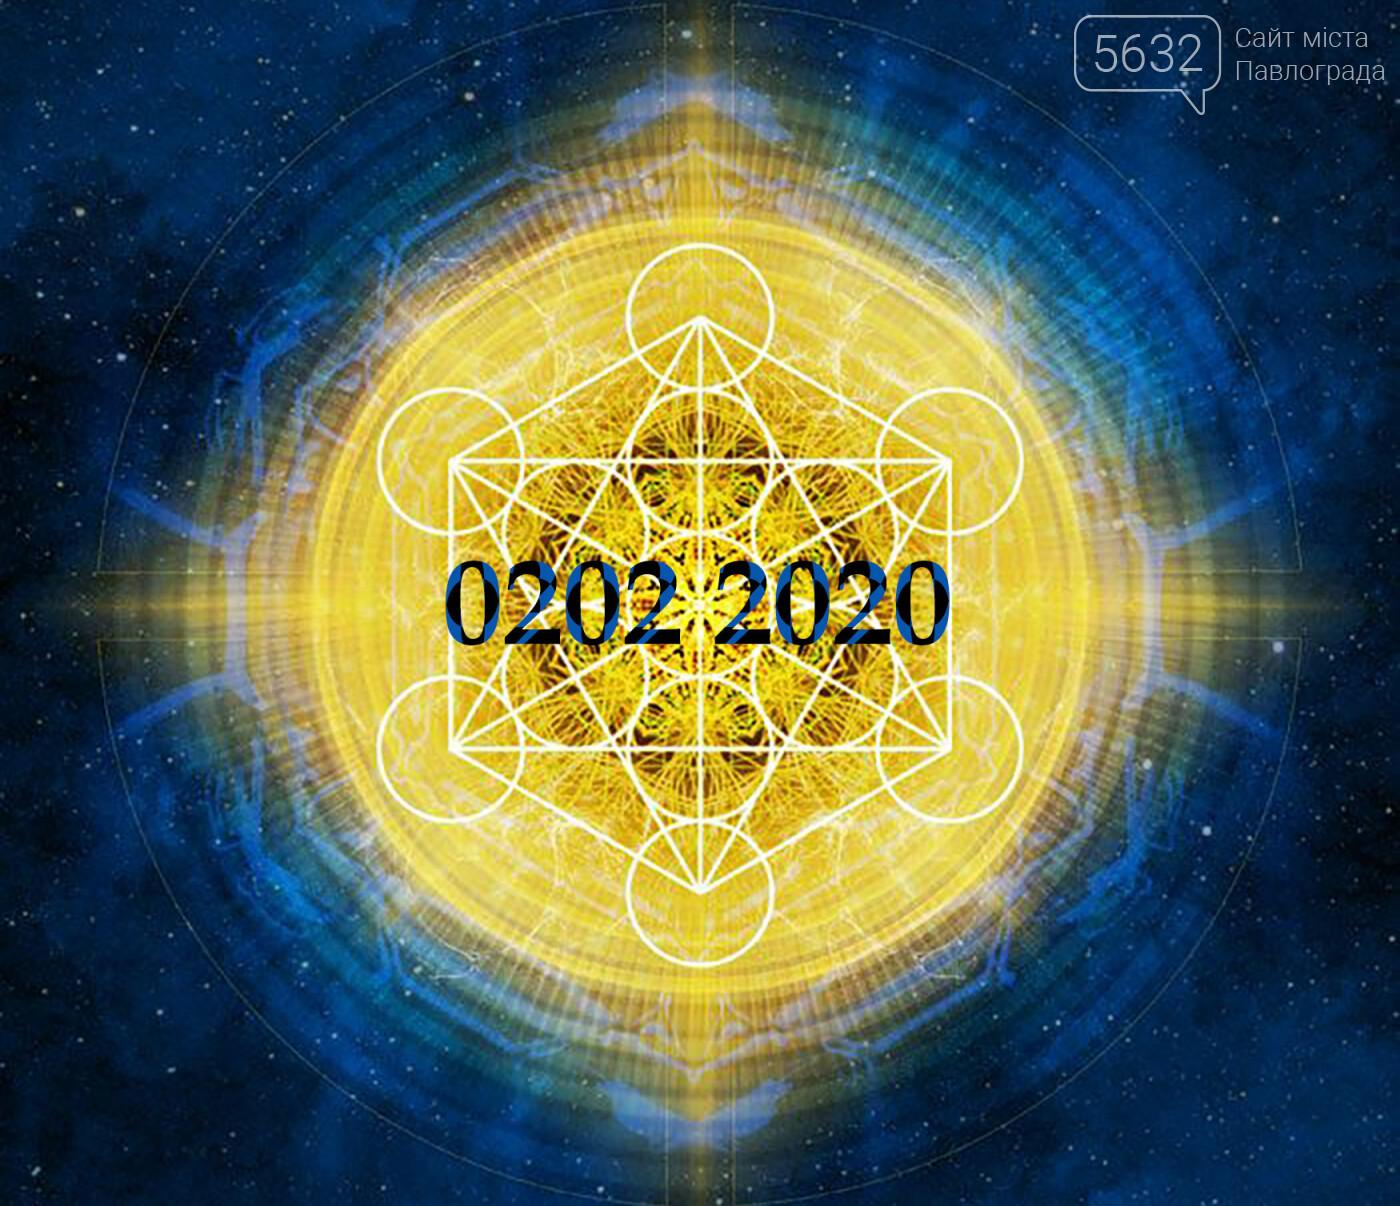 Магия чисел: 02022020, фото-1